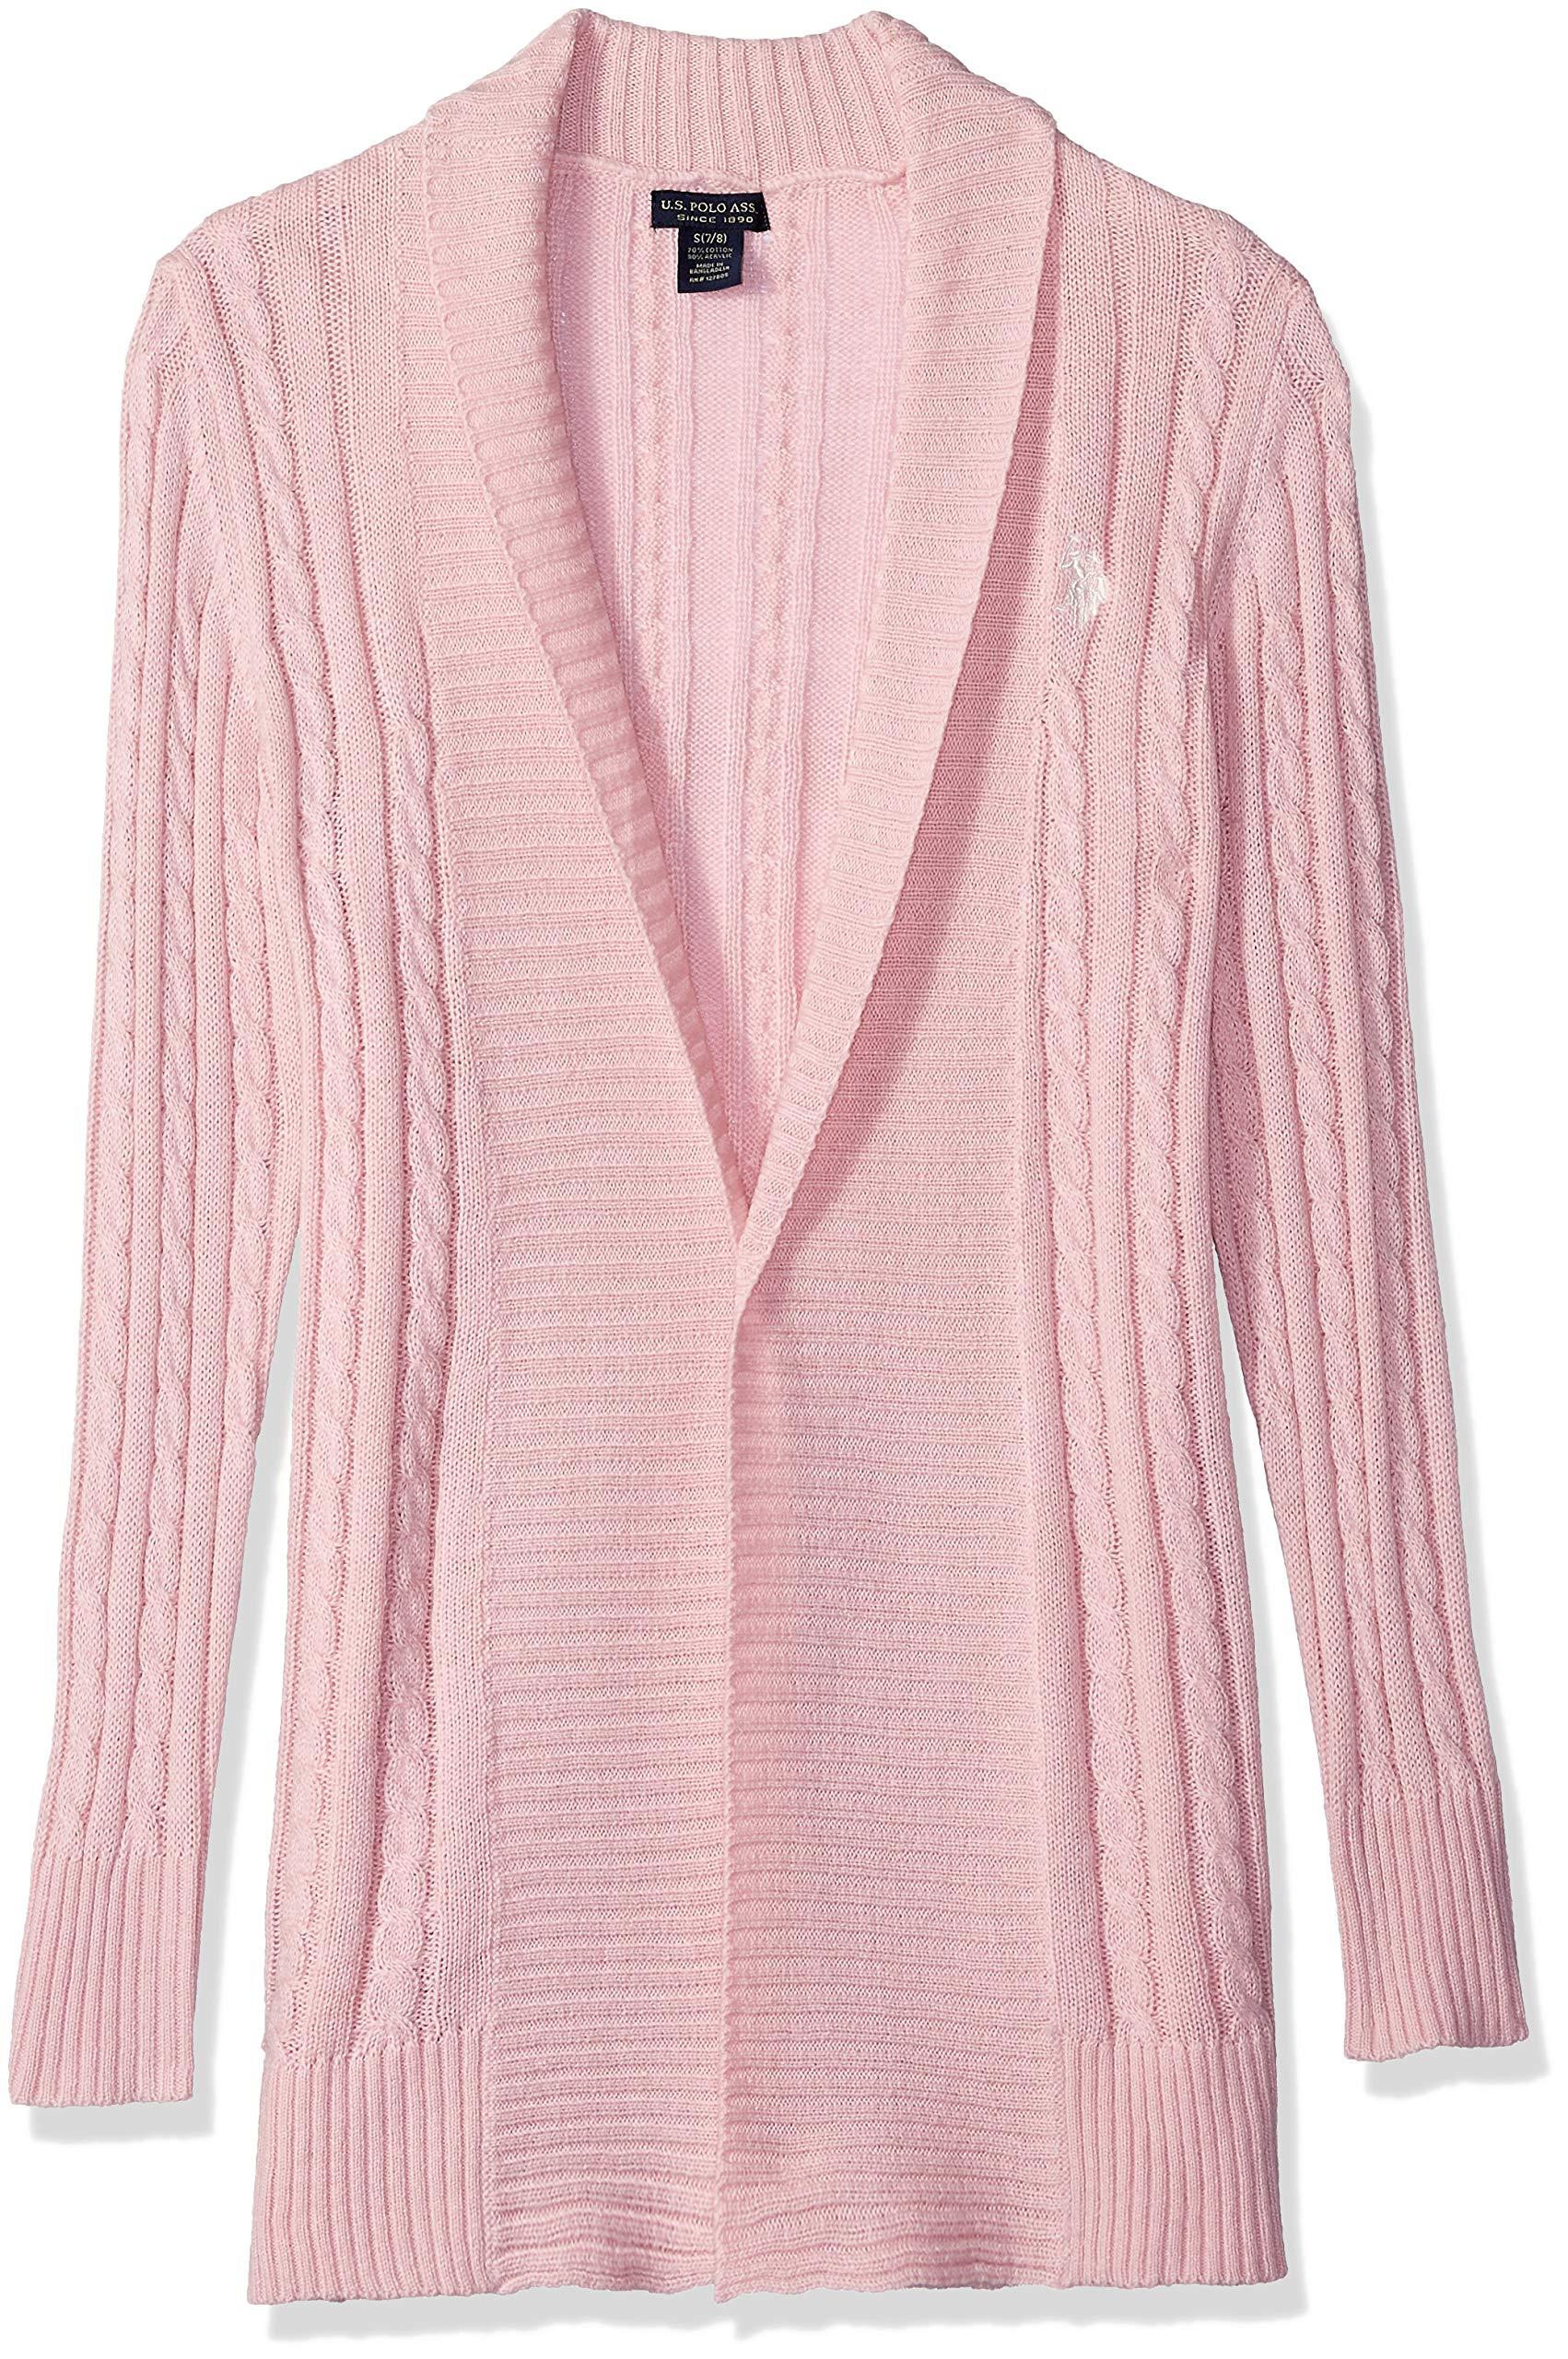 U.S. Polo Assn. Girls' Big Cardigan Sweater, Cable Knit Rose, 10/12